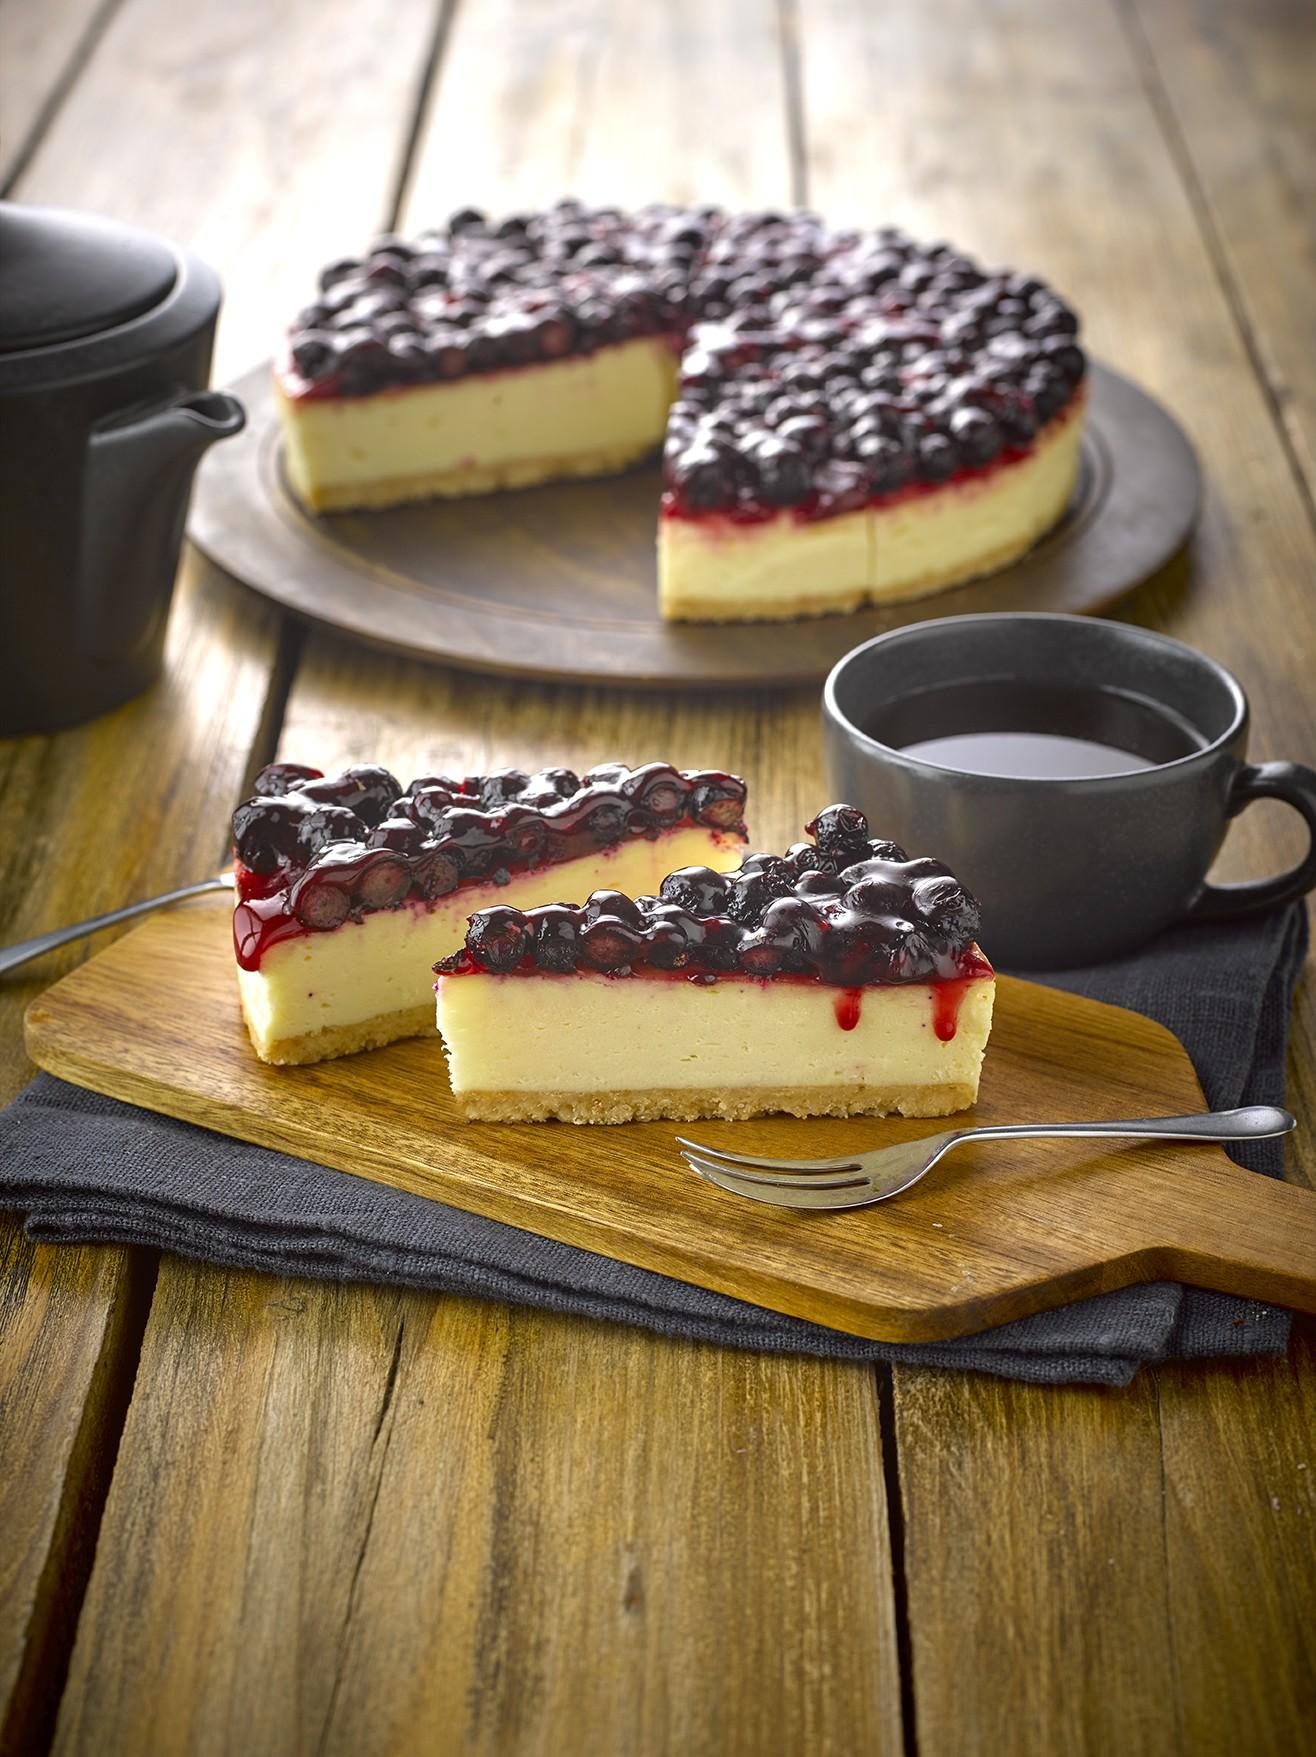 Sidoli Gluten Free Blackcurrant & Prosecco Cheesecake